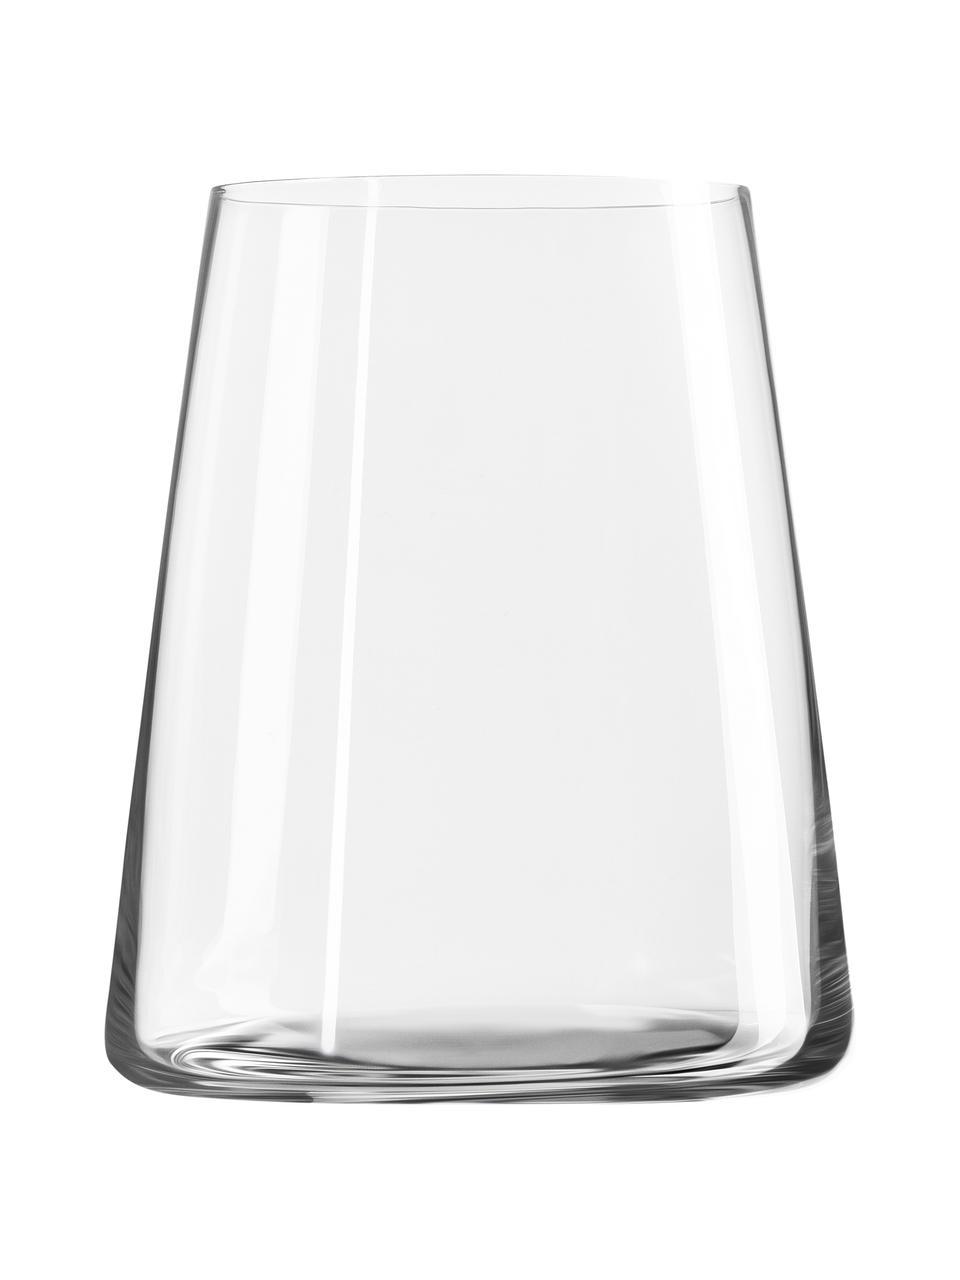 Bicchiere in cristallo Power 6 pz, Cristallo, Trasparente, Ø 9 x Alt. 10 cm